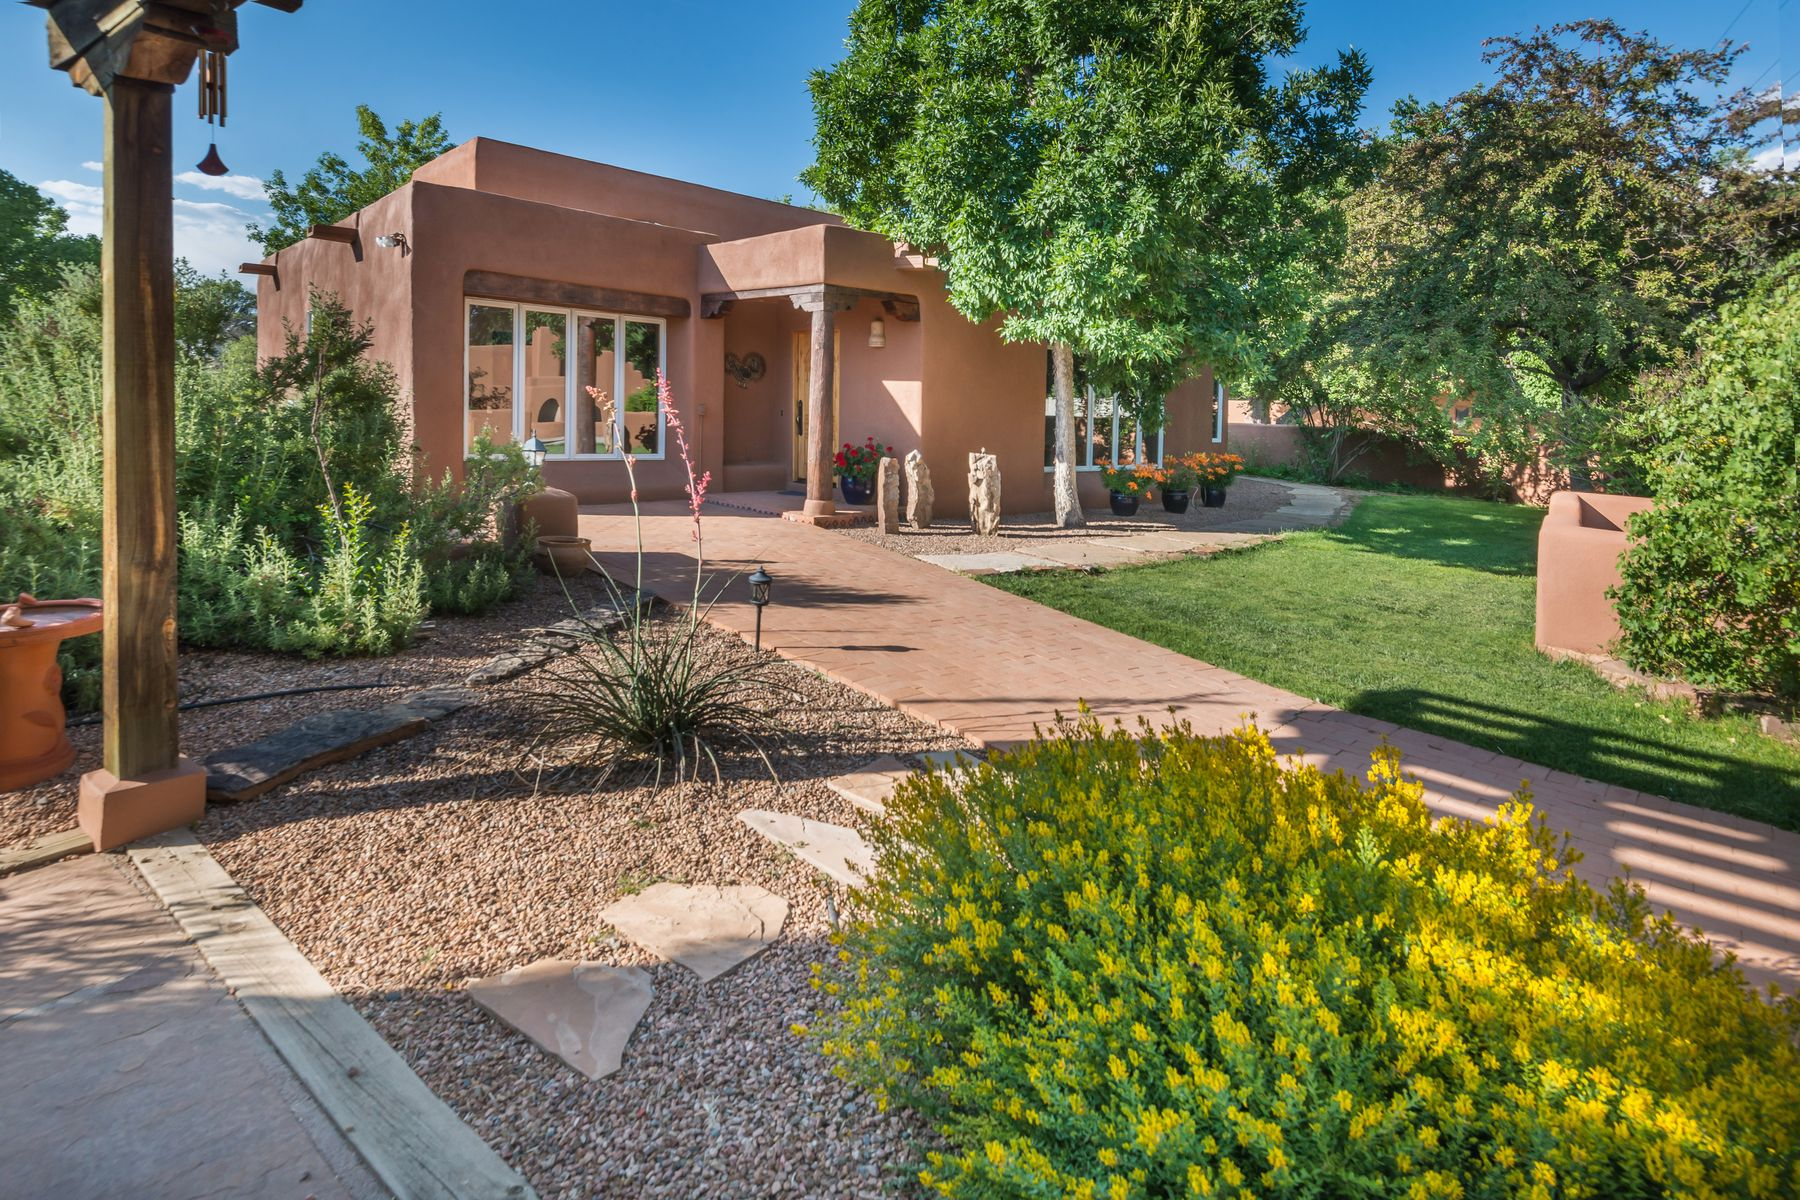 Single Family Homes للـ Sale في 1 Jerry Hatchet Lane 1 Jerry Hatchet Ln, Nambe, New Mexico 87506 United States